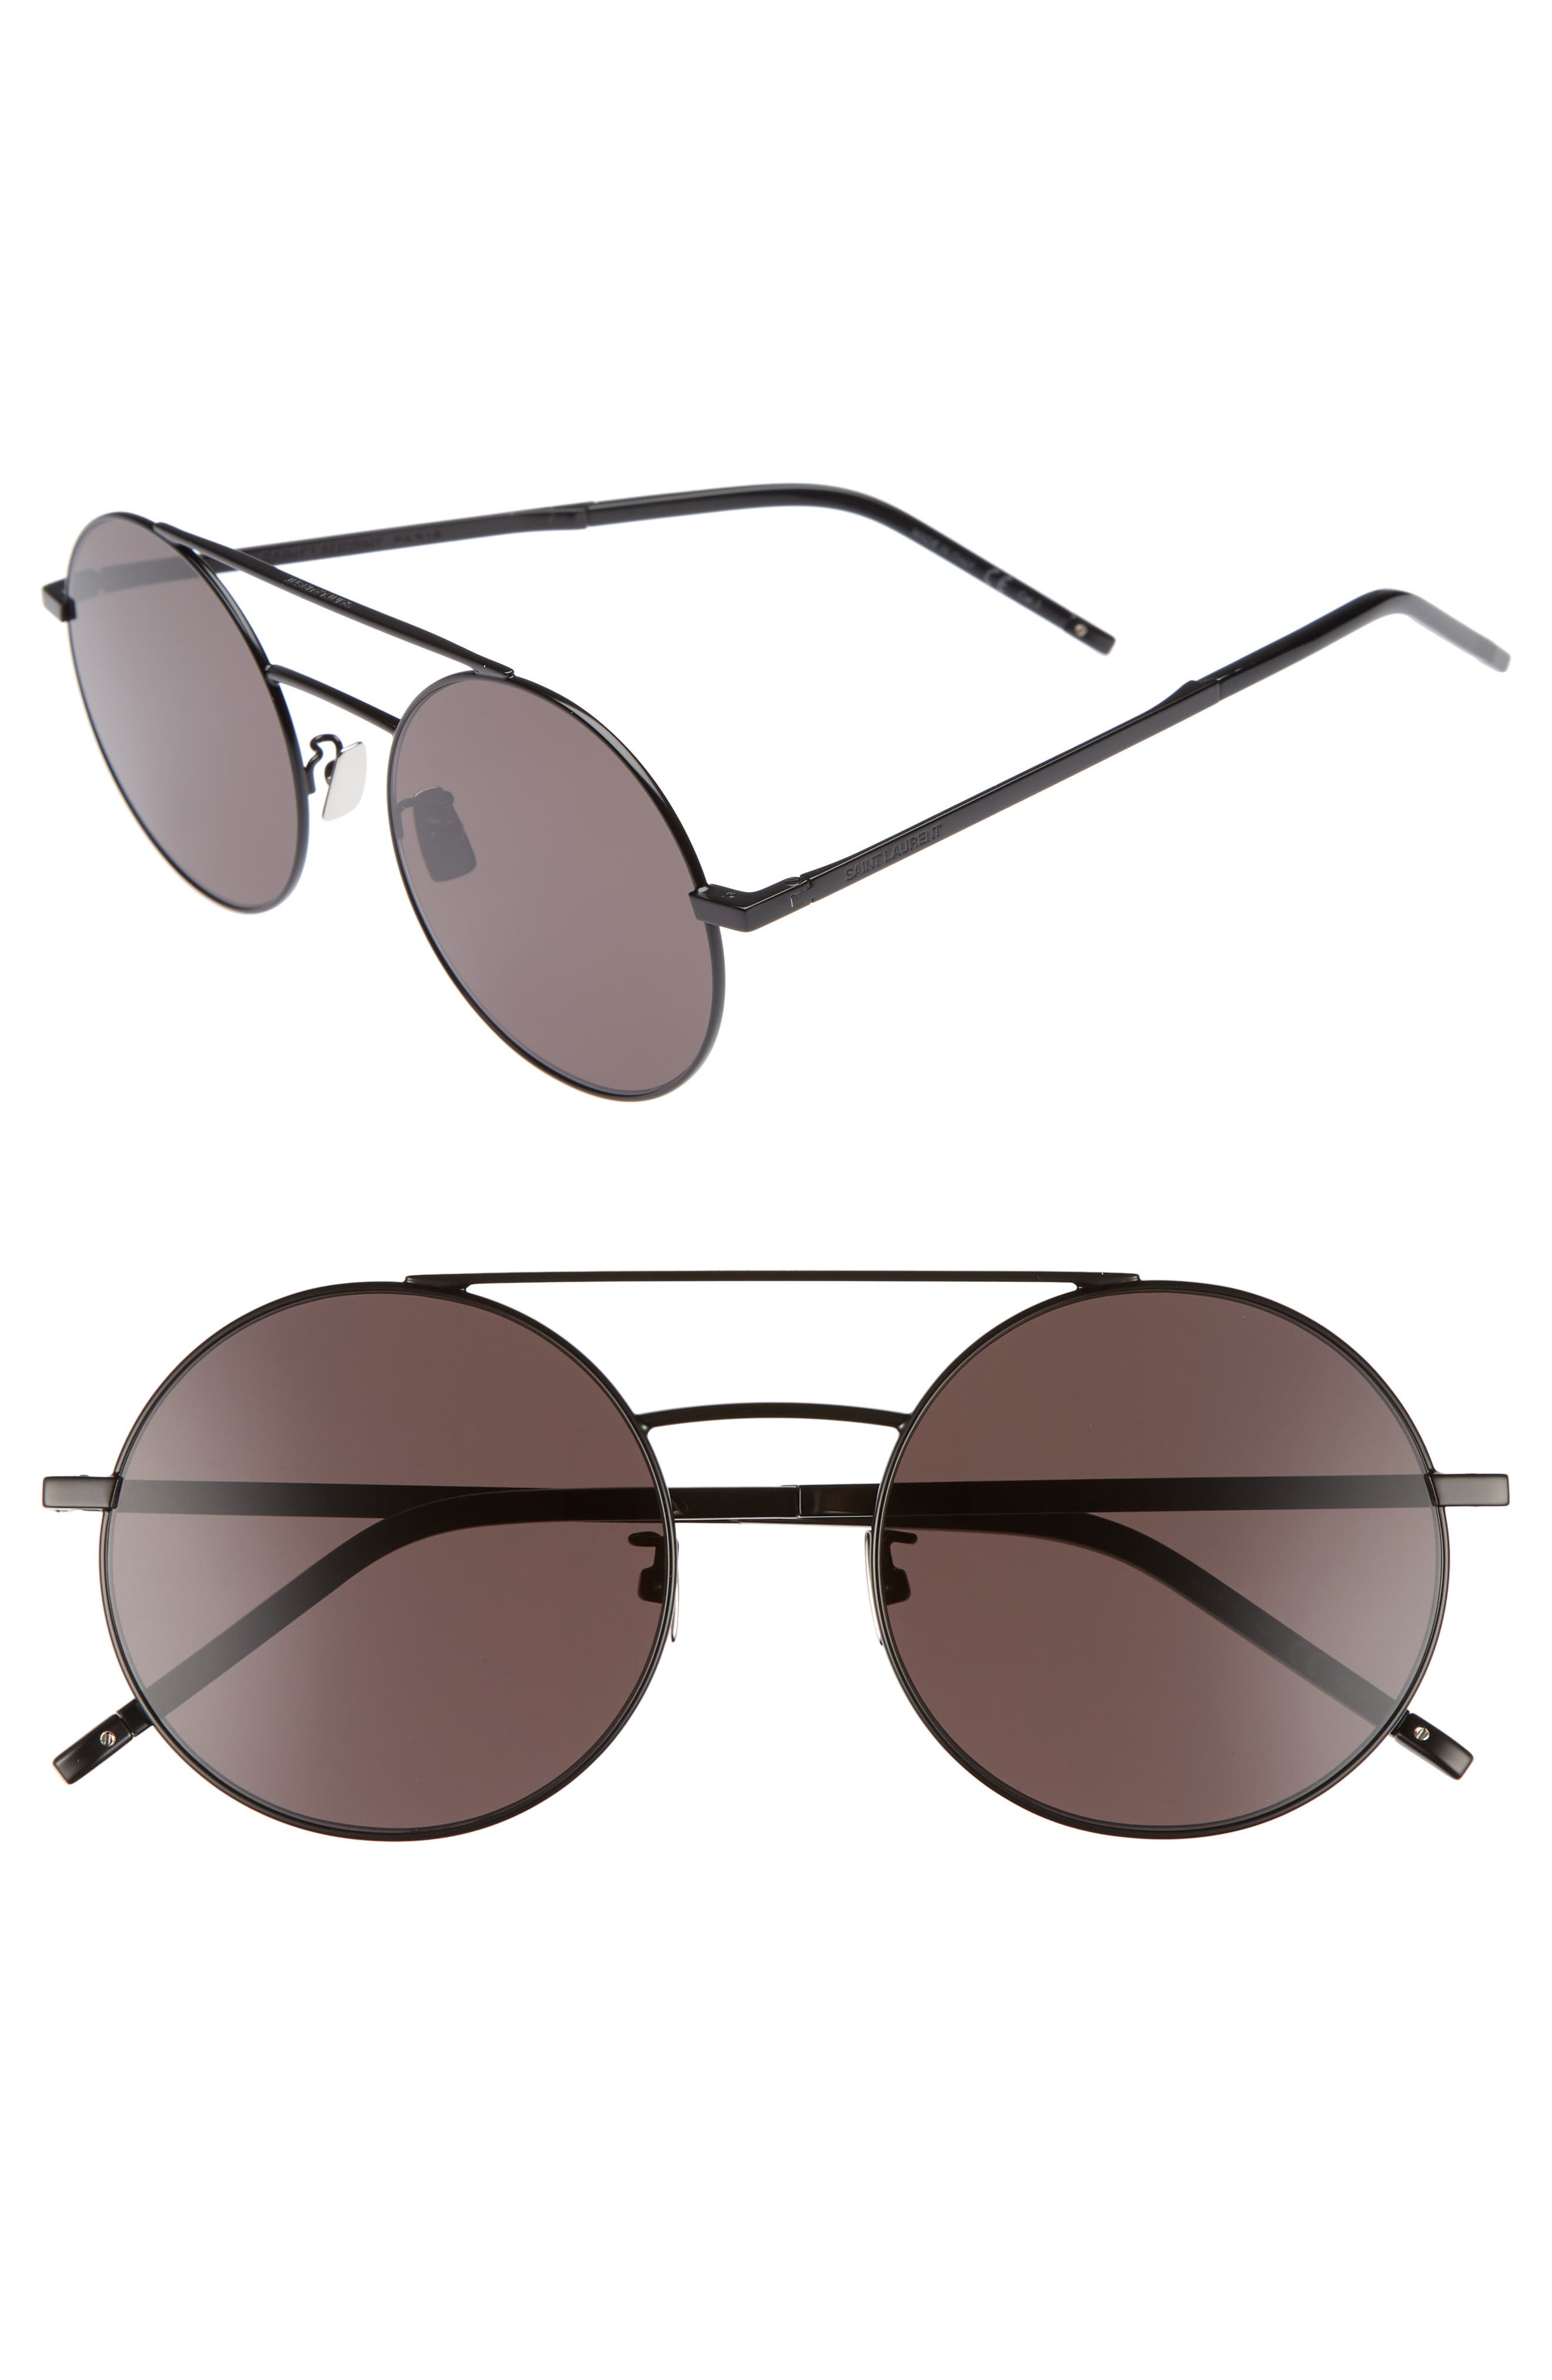 SL 210/F 56mm Round Aviator Sunglasses,                             Main thumbnail 1, color,                             002